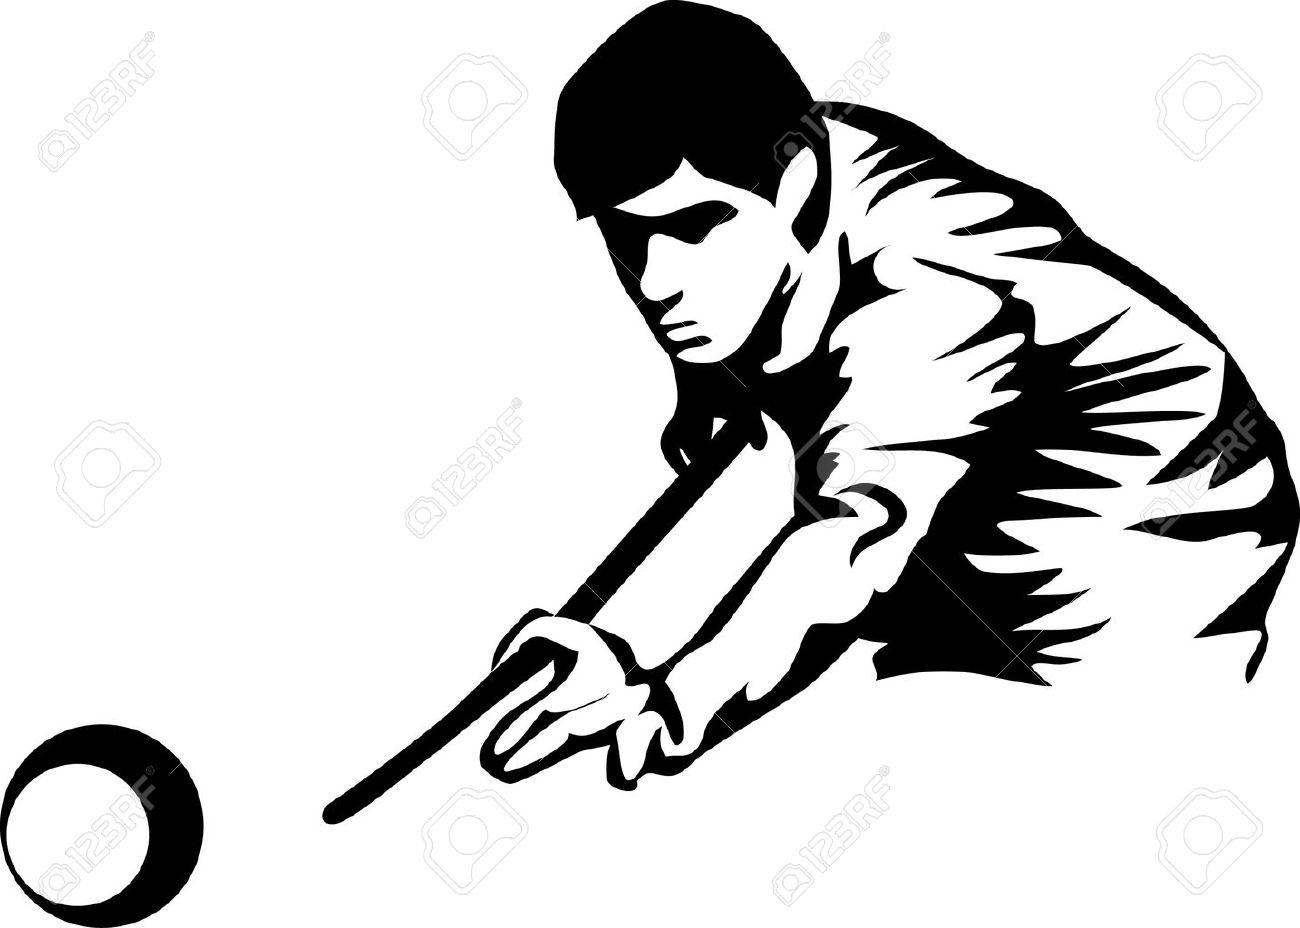 billiards black and white. Billiards Player Stock Vector - 17031329 Black And White